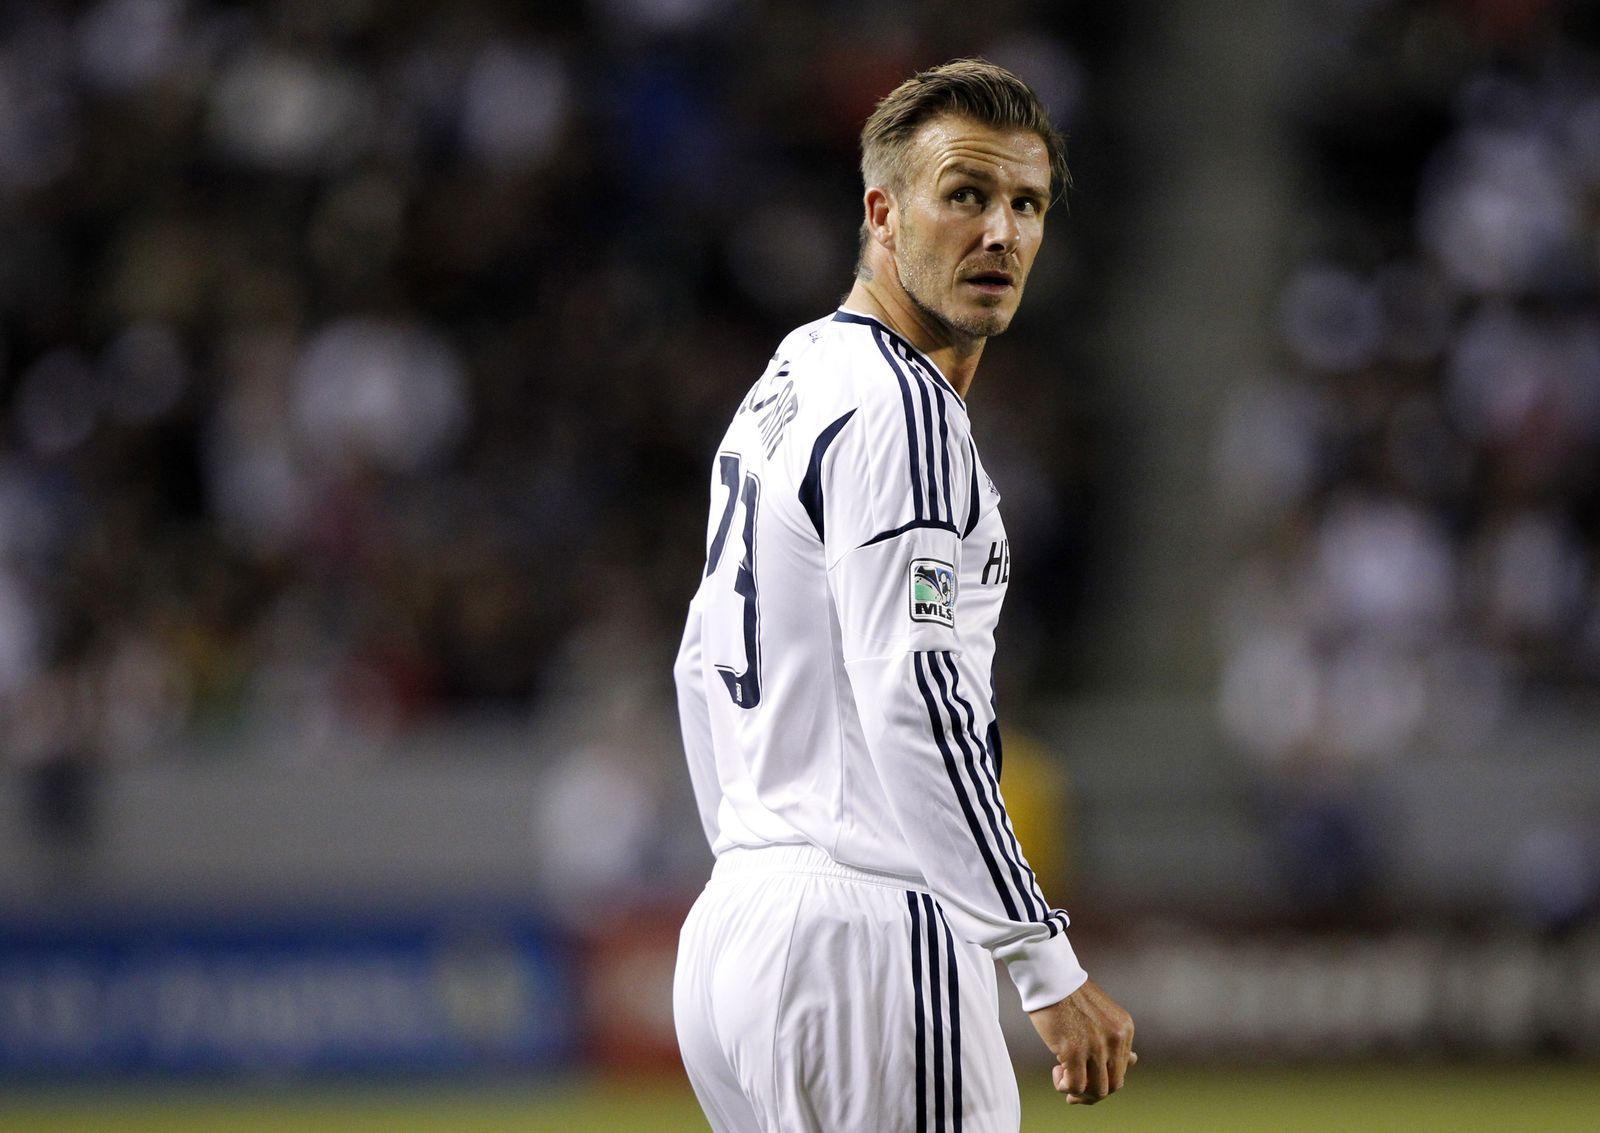 Soccer Beckham Down Under?